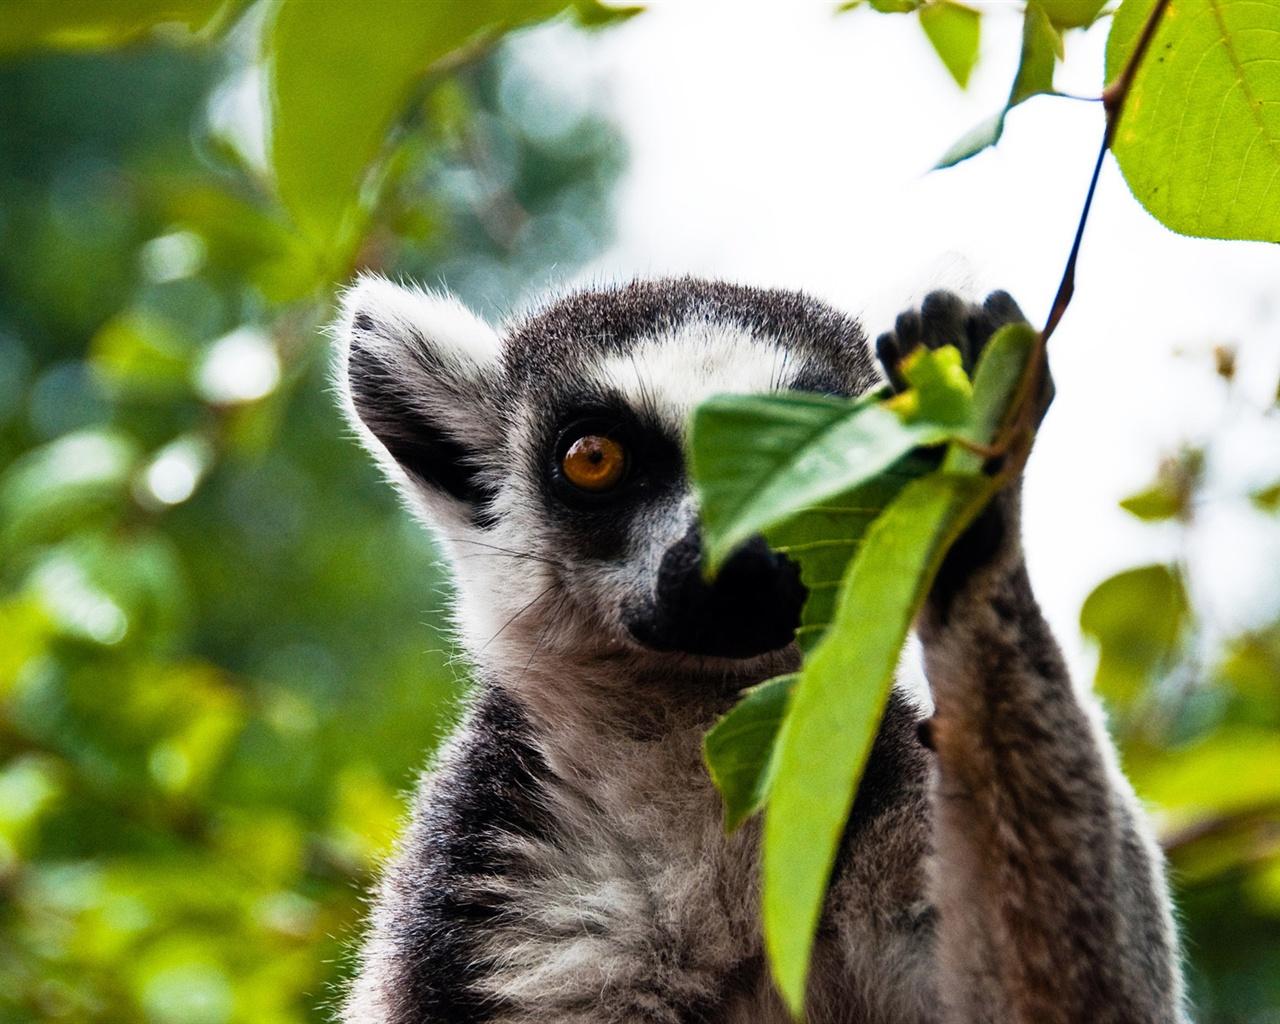 download wallpaper 3840x2160 lemur - photo #16